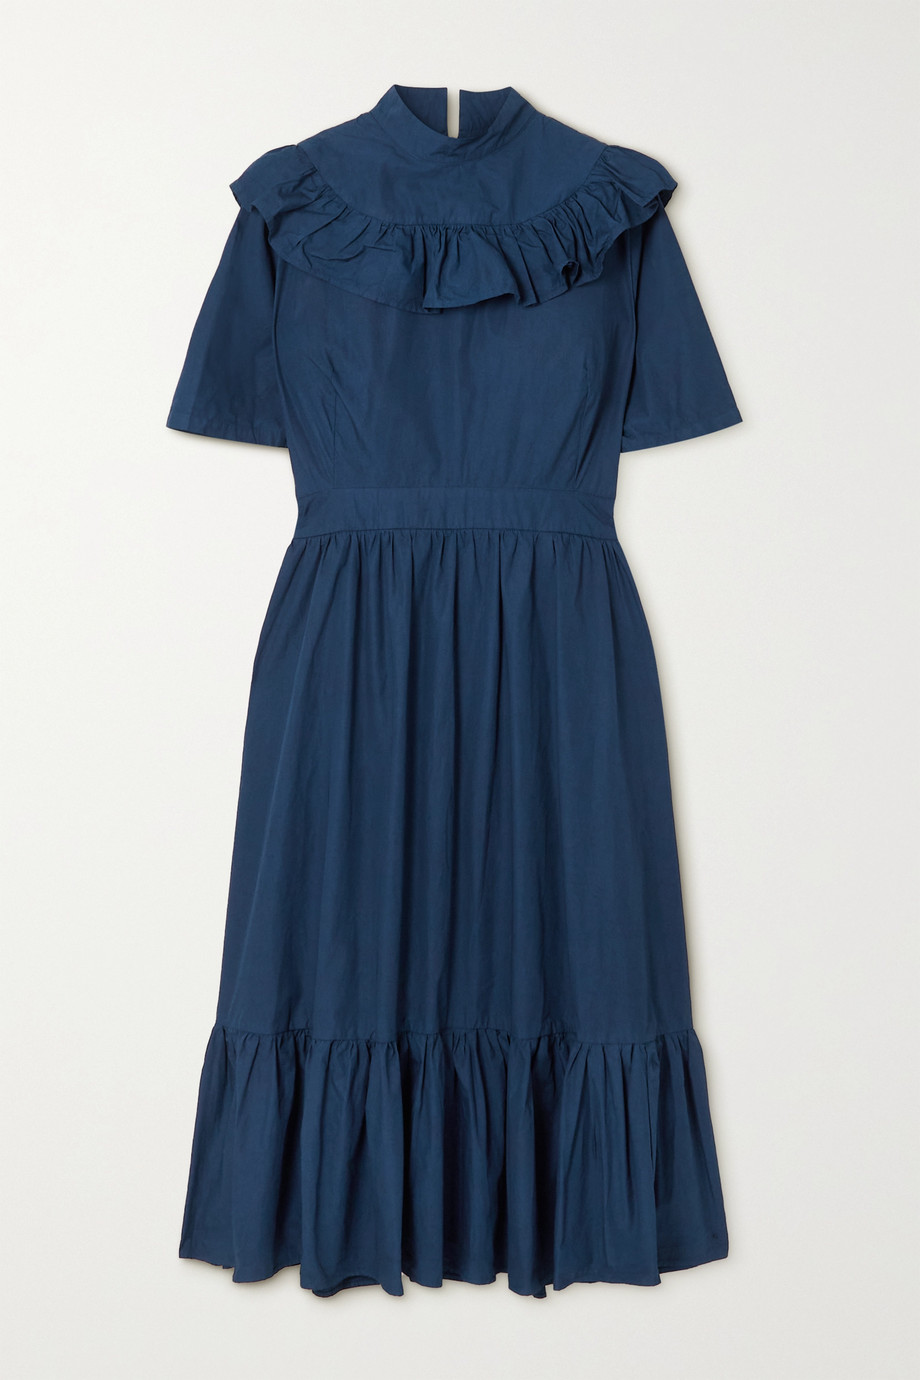 Sindiso Khumalo + NET SUSTAIN ruffled tiered cotton midi dress